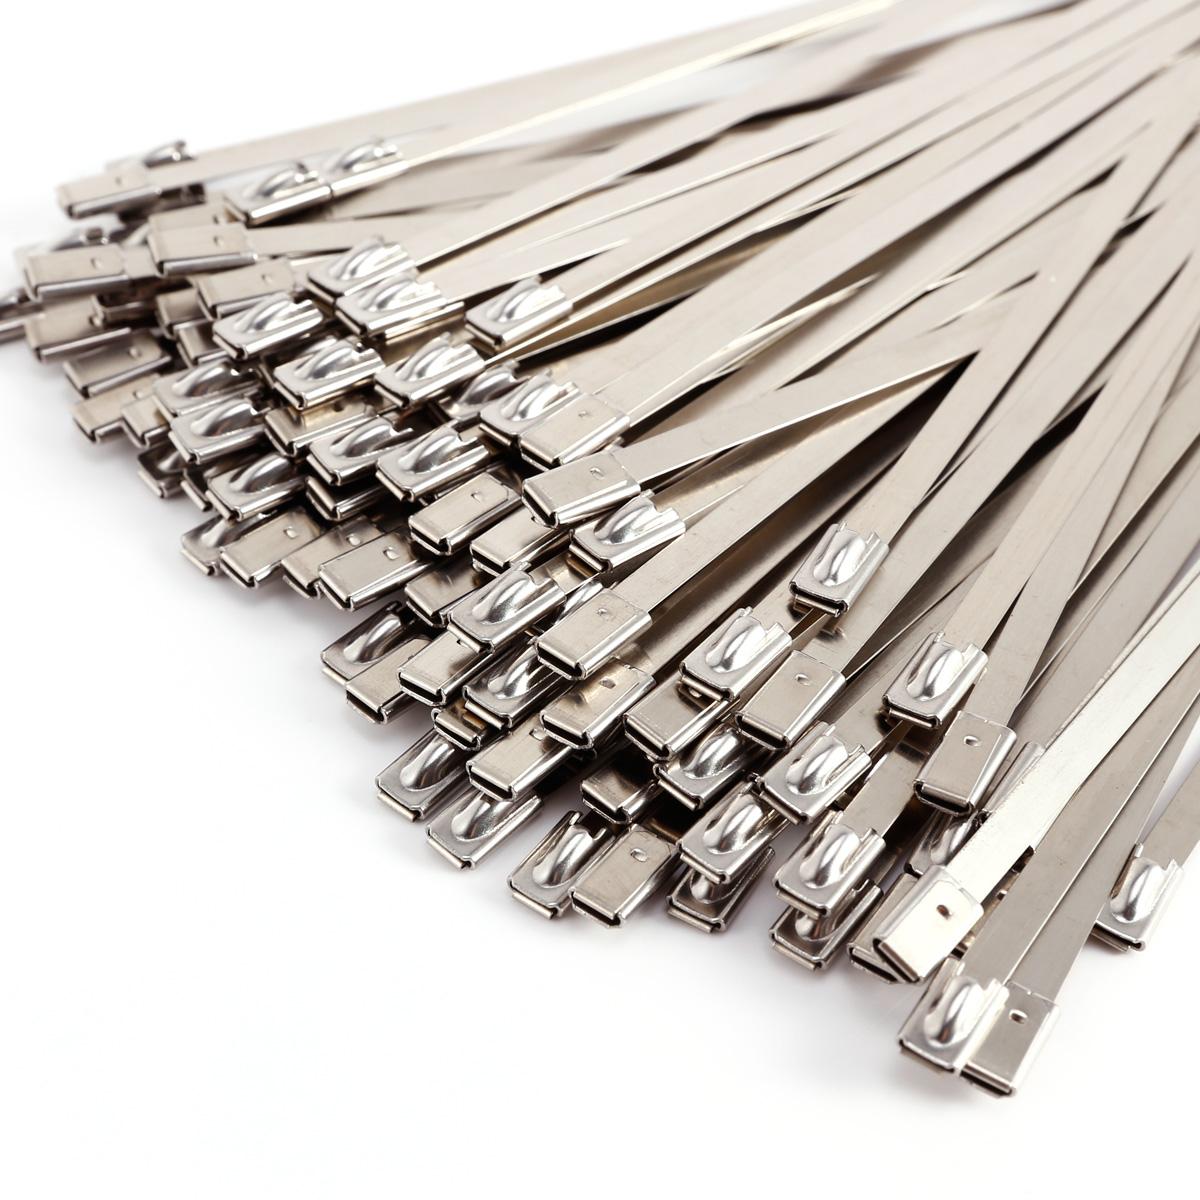 100 x Edelstahl Kabelbinder Metall Kabelbinder Hitzeschutzband ...